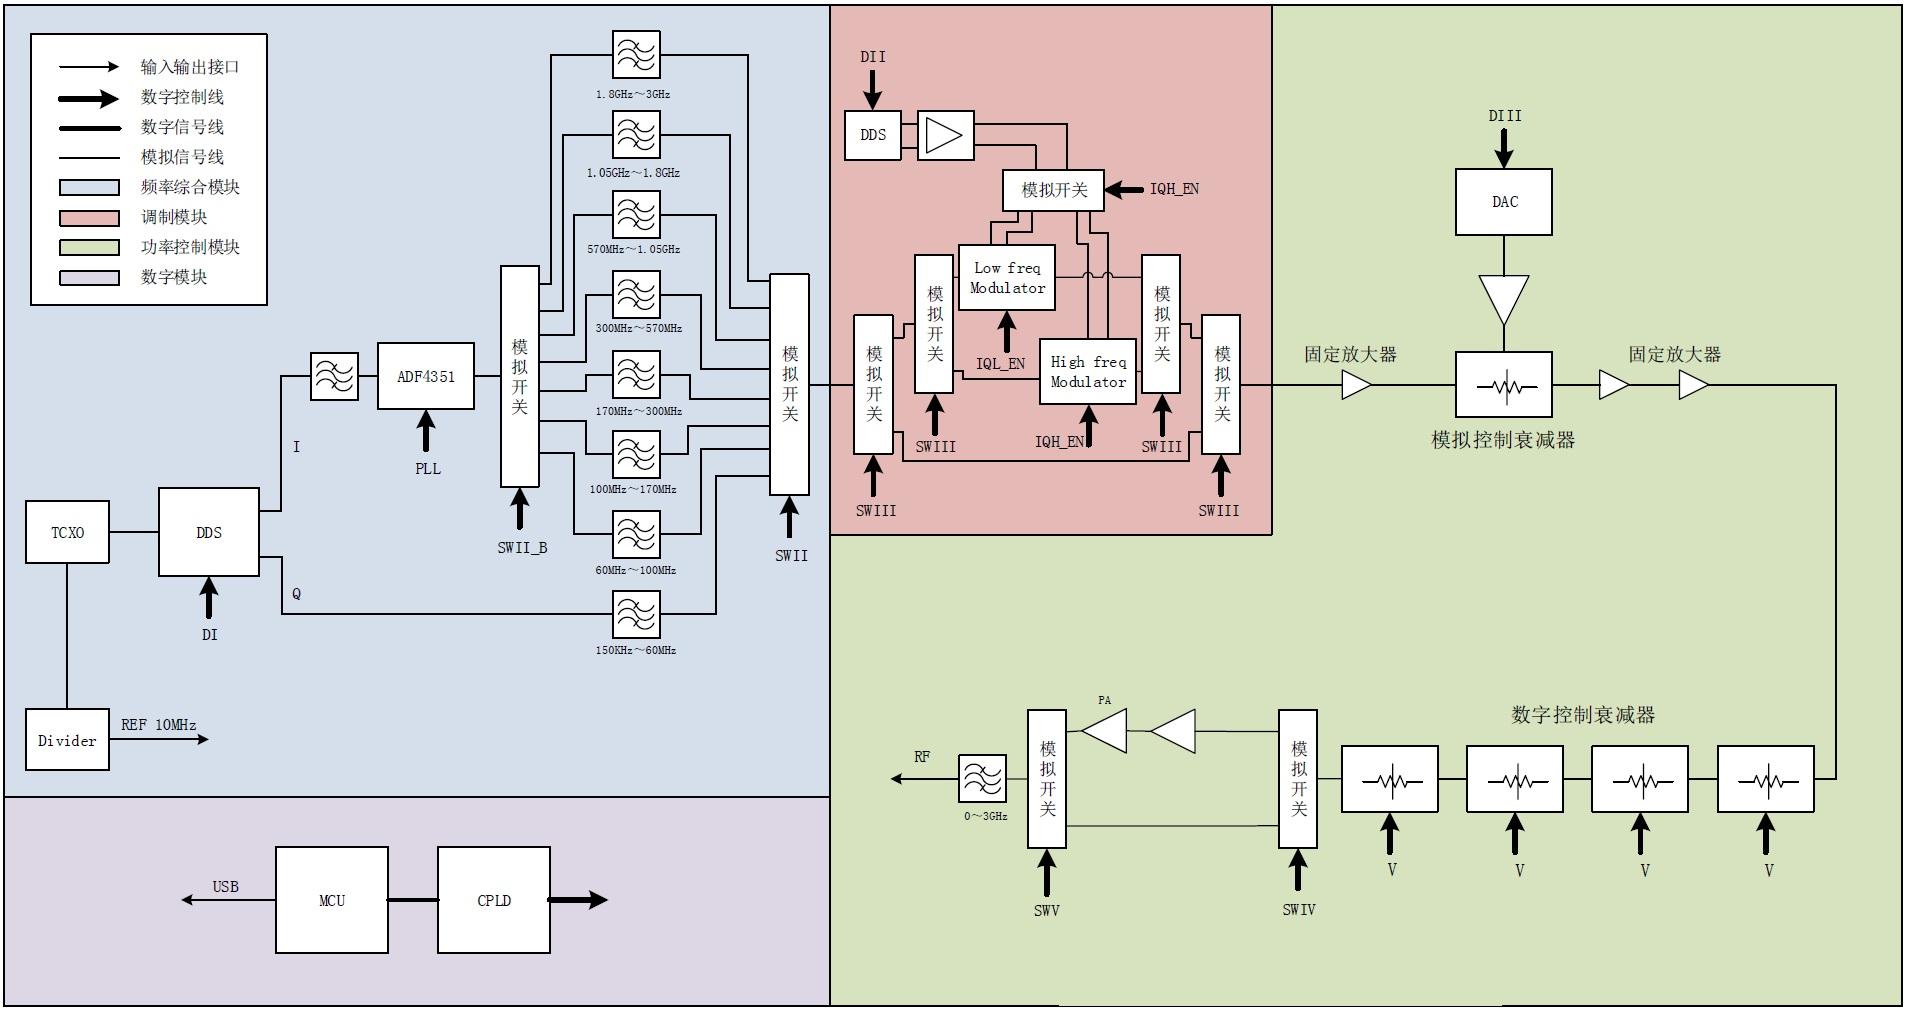 Fig. 1. System block diagram